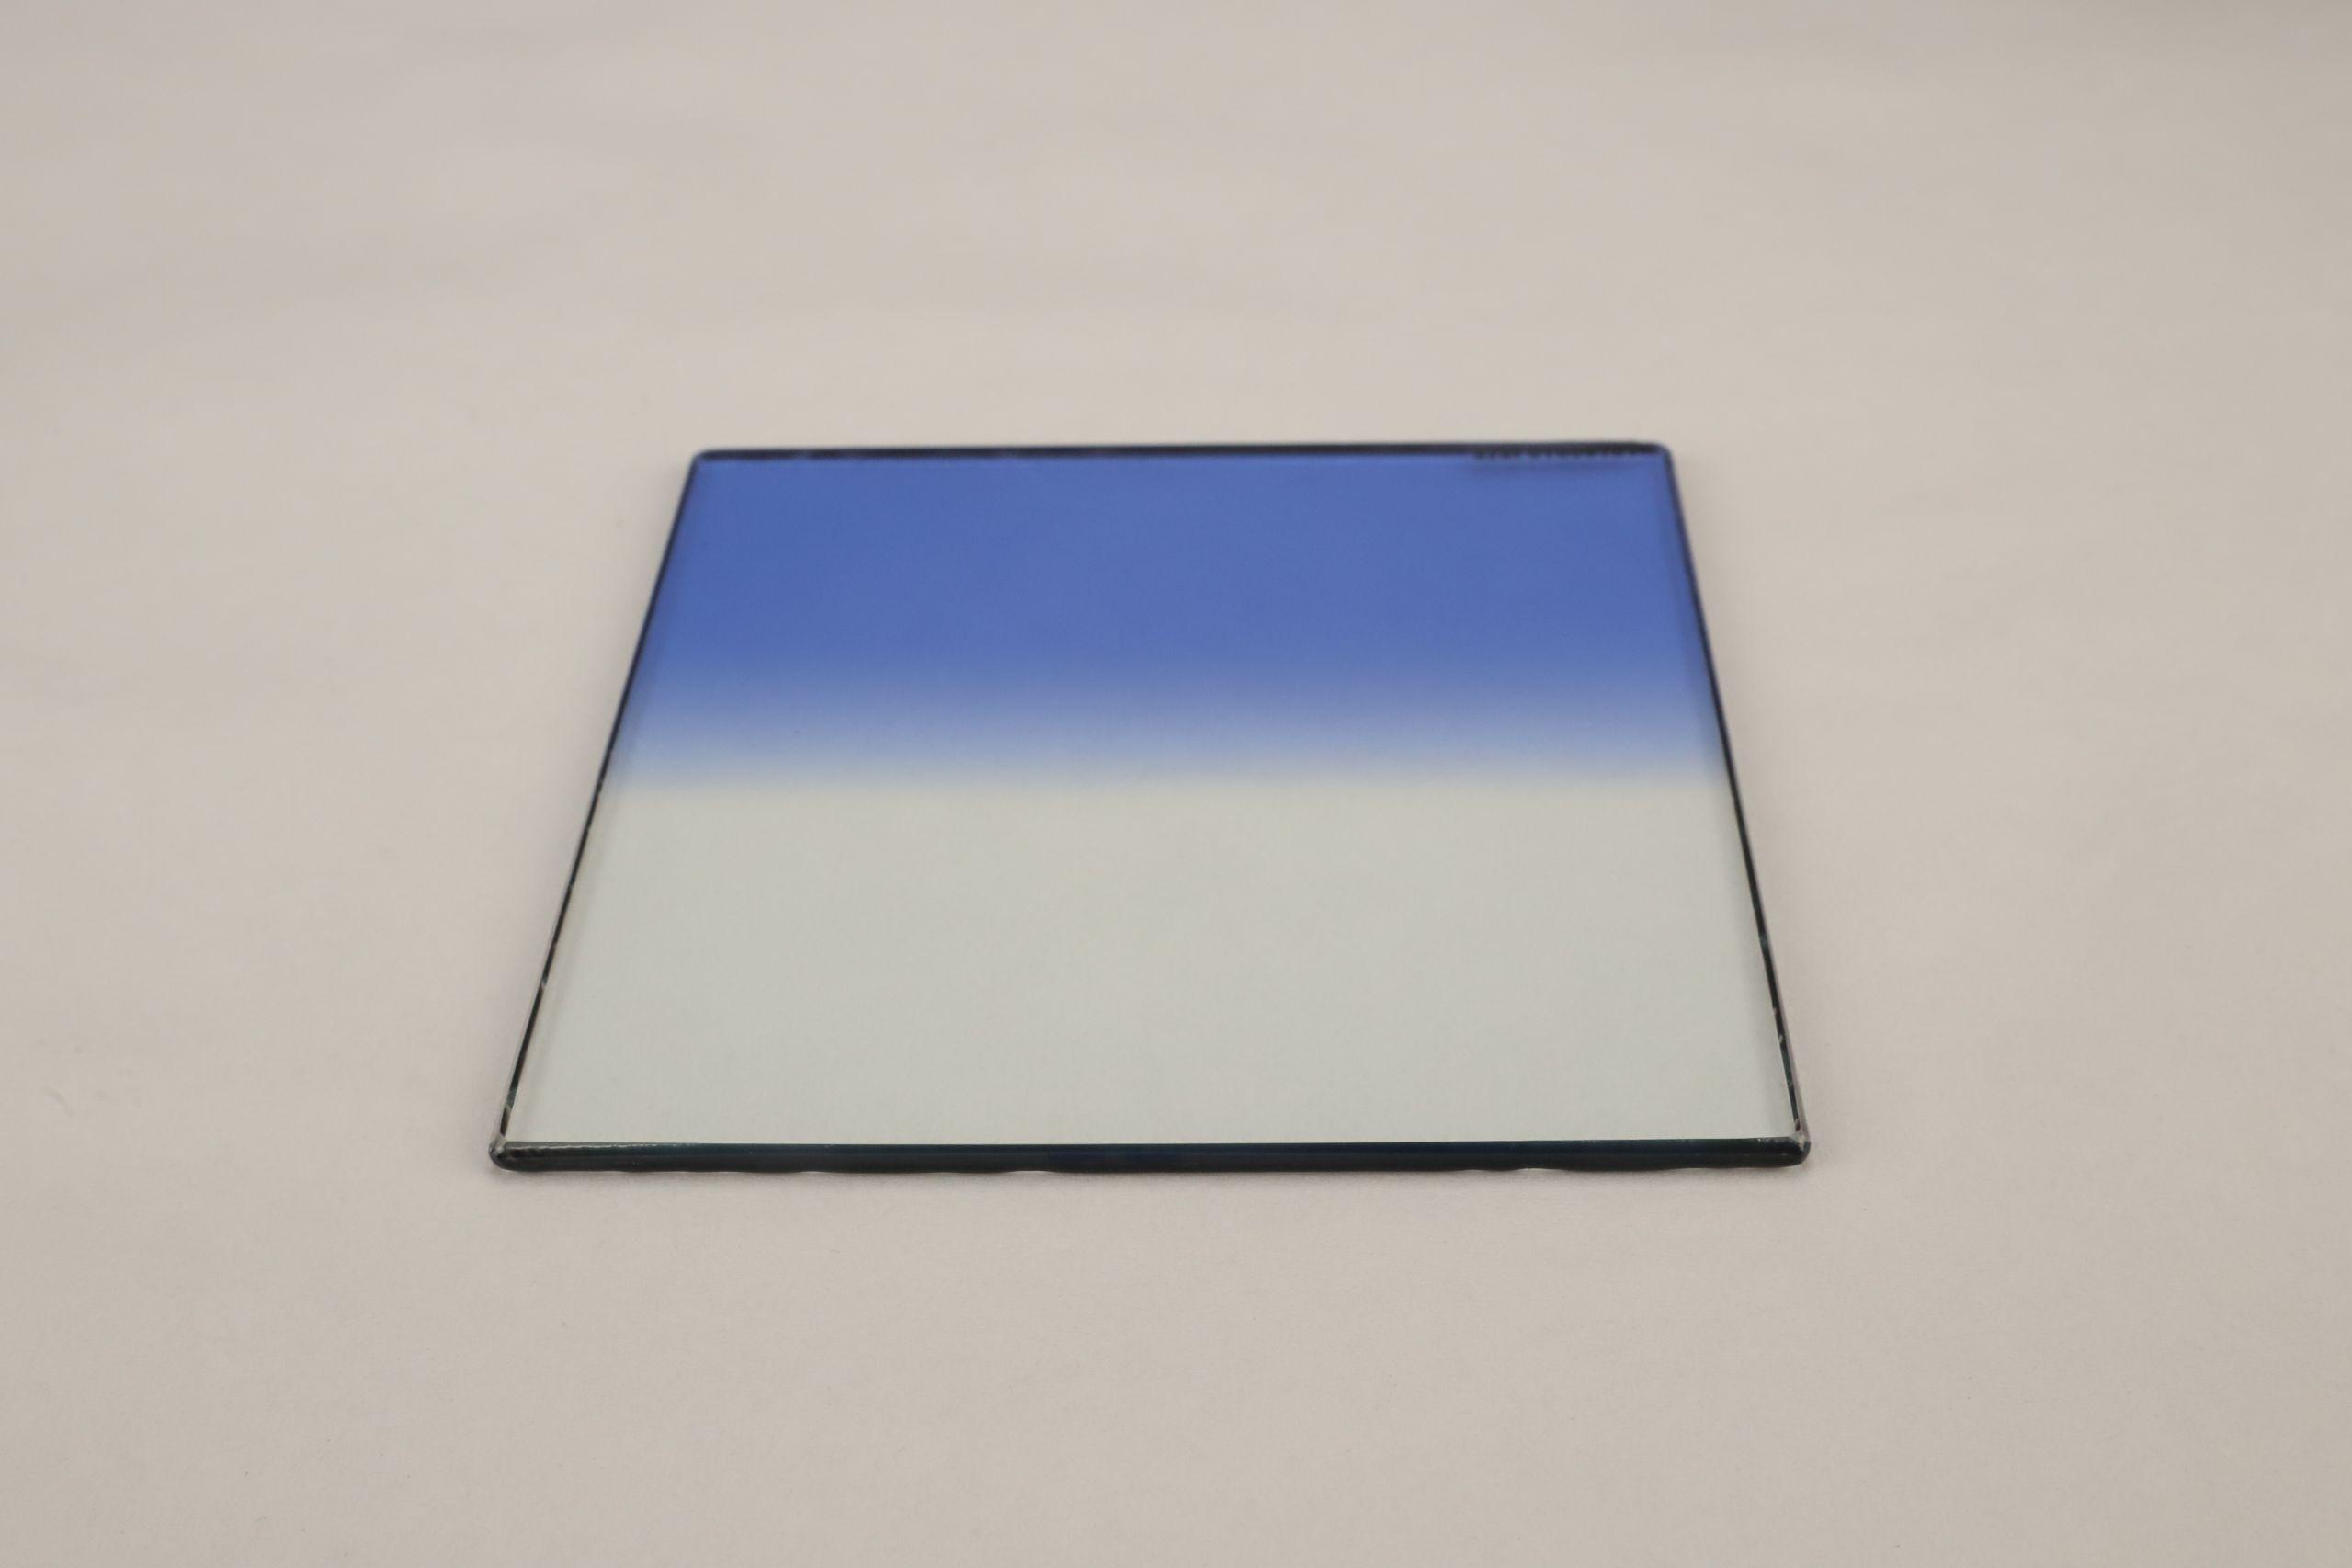 Tiffen 5x5 CLR BLUE 3 GRAD SOFT